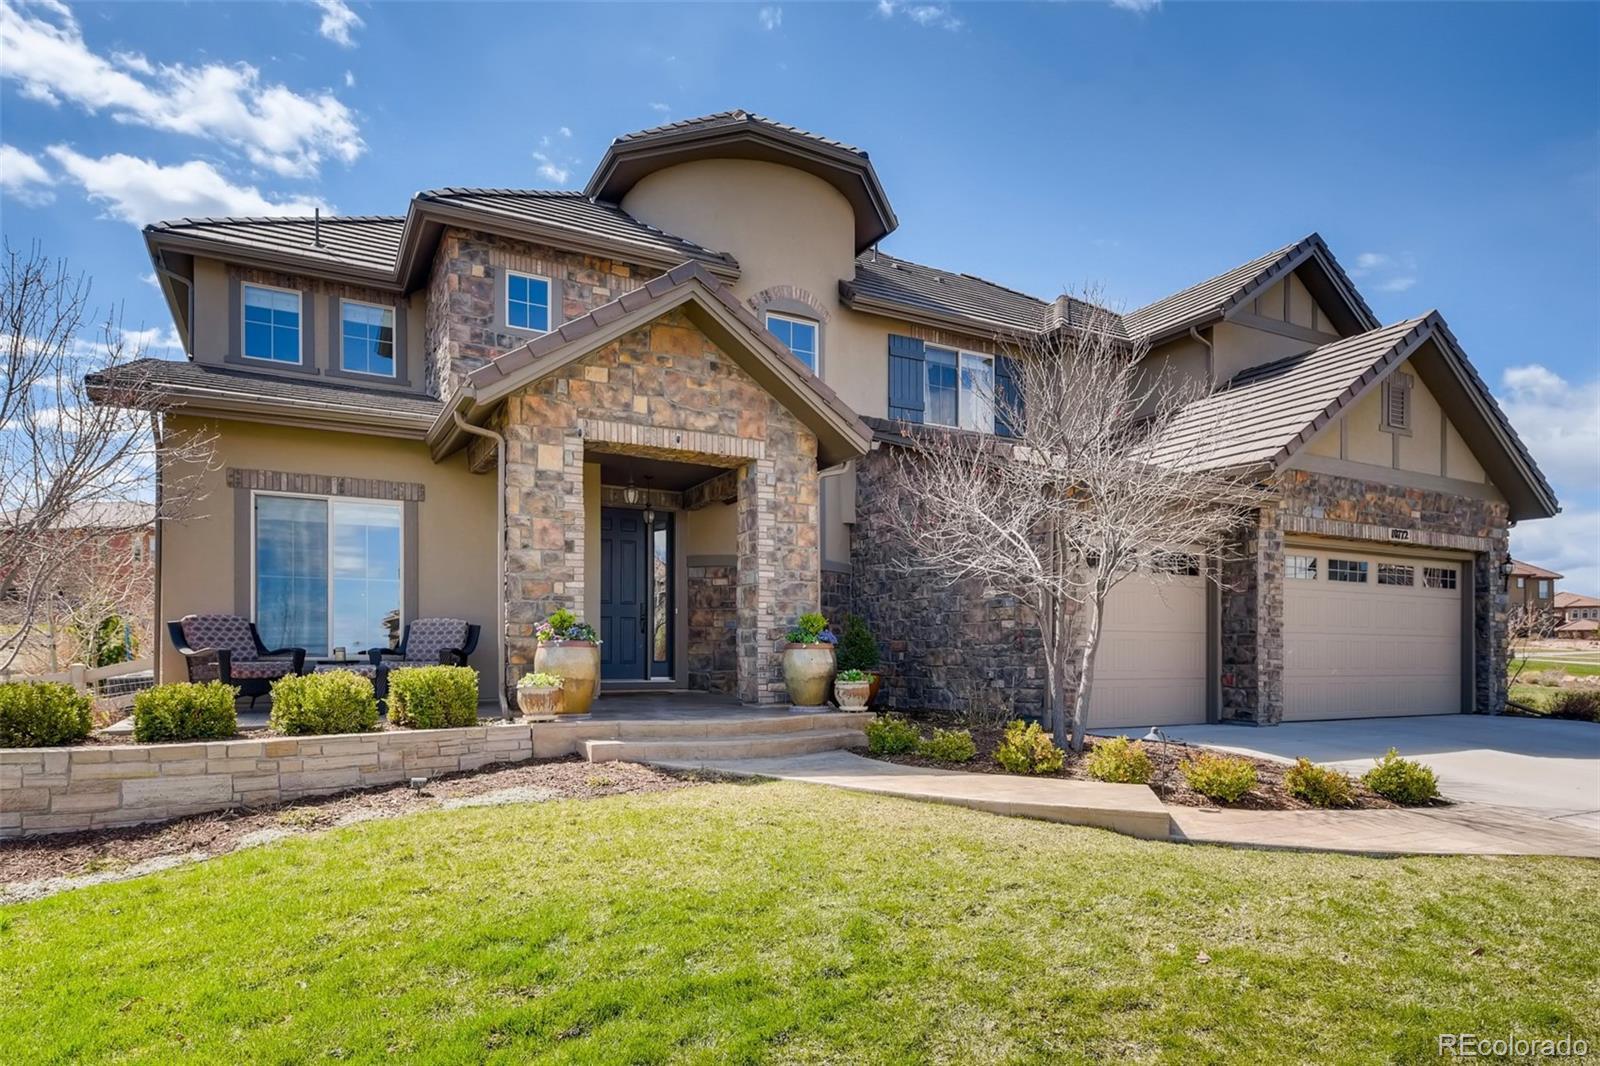 10772 Sundial Rim Road, Highlands Ranch, CO 80126 - Highlands Ranch, CO real estate listing